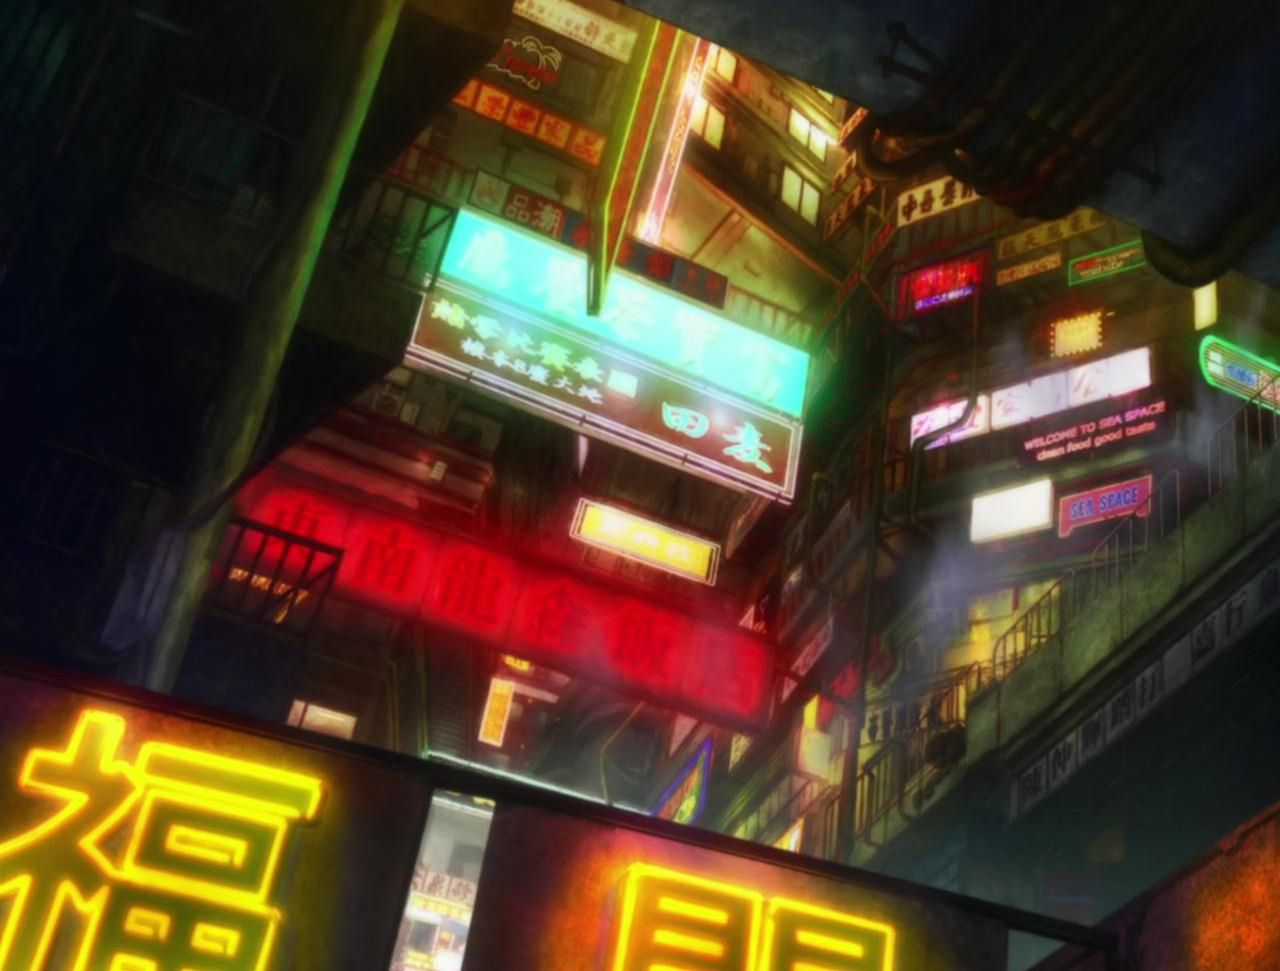 Psycho Pass. Directed by Naoyoshi Shiotani. Created by Production I.G.